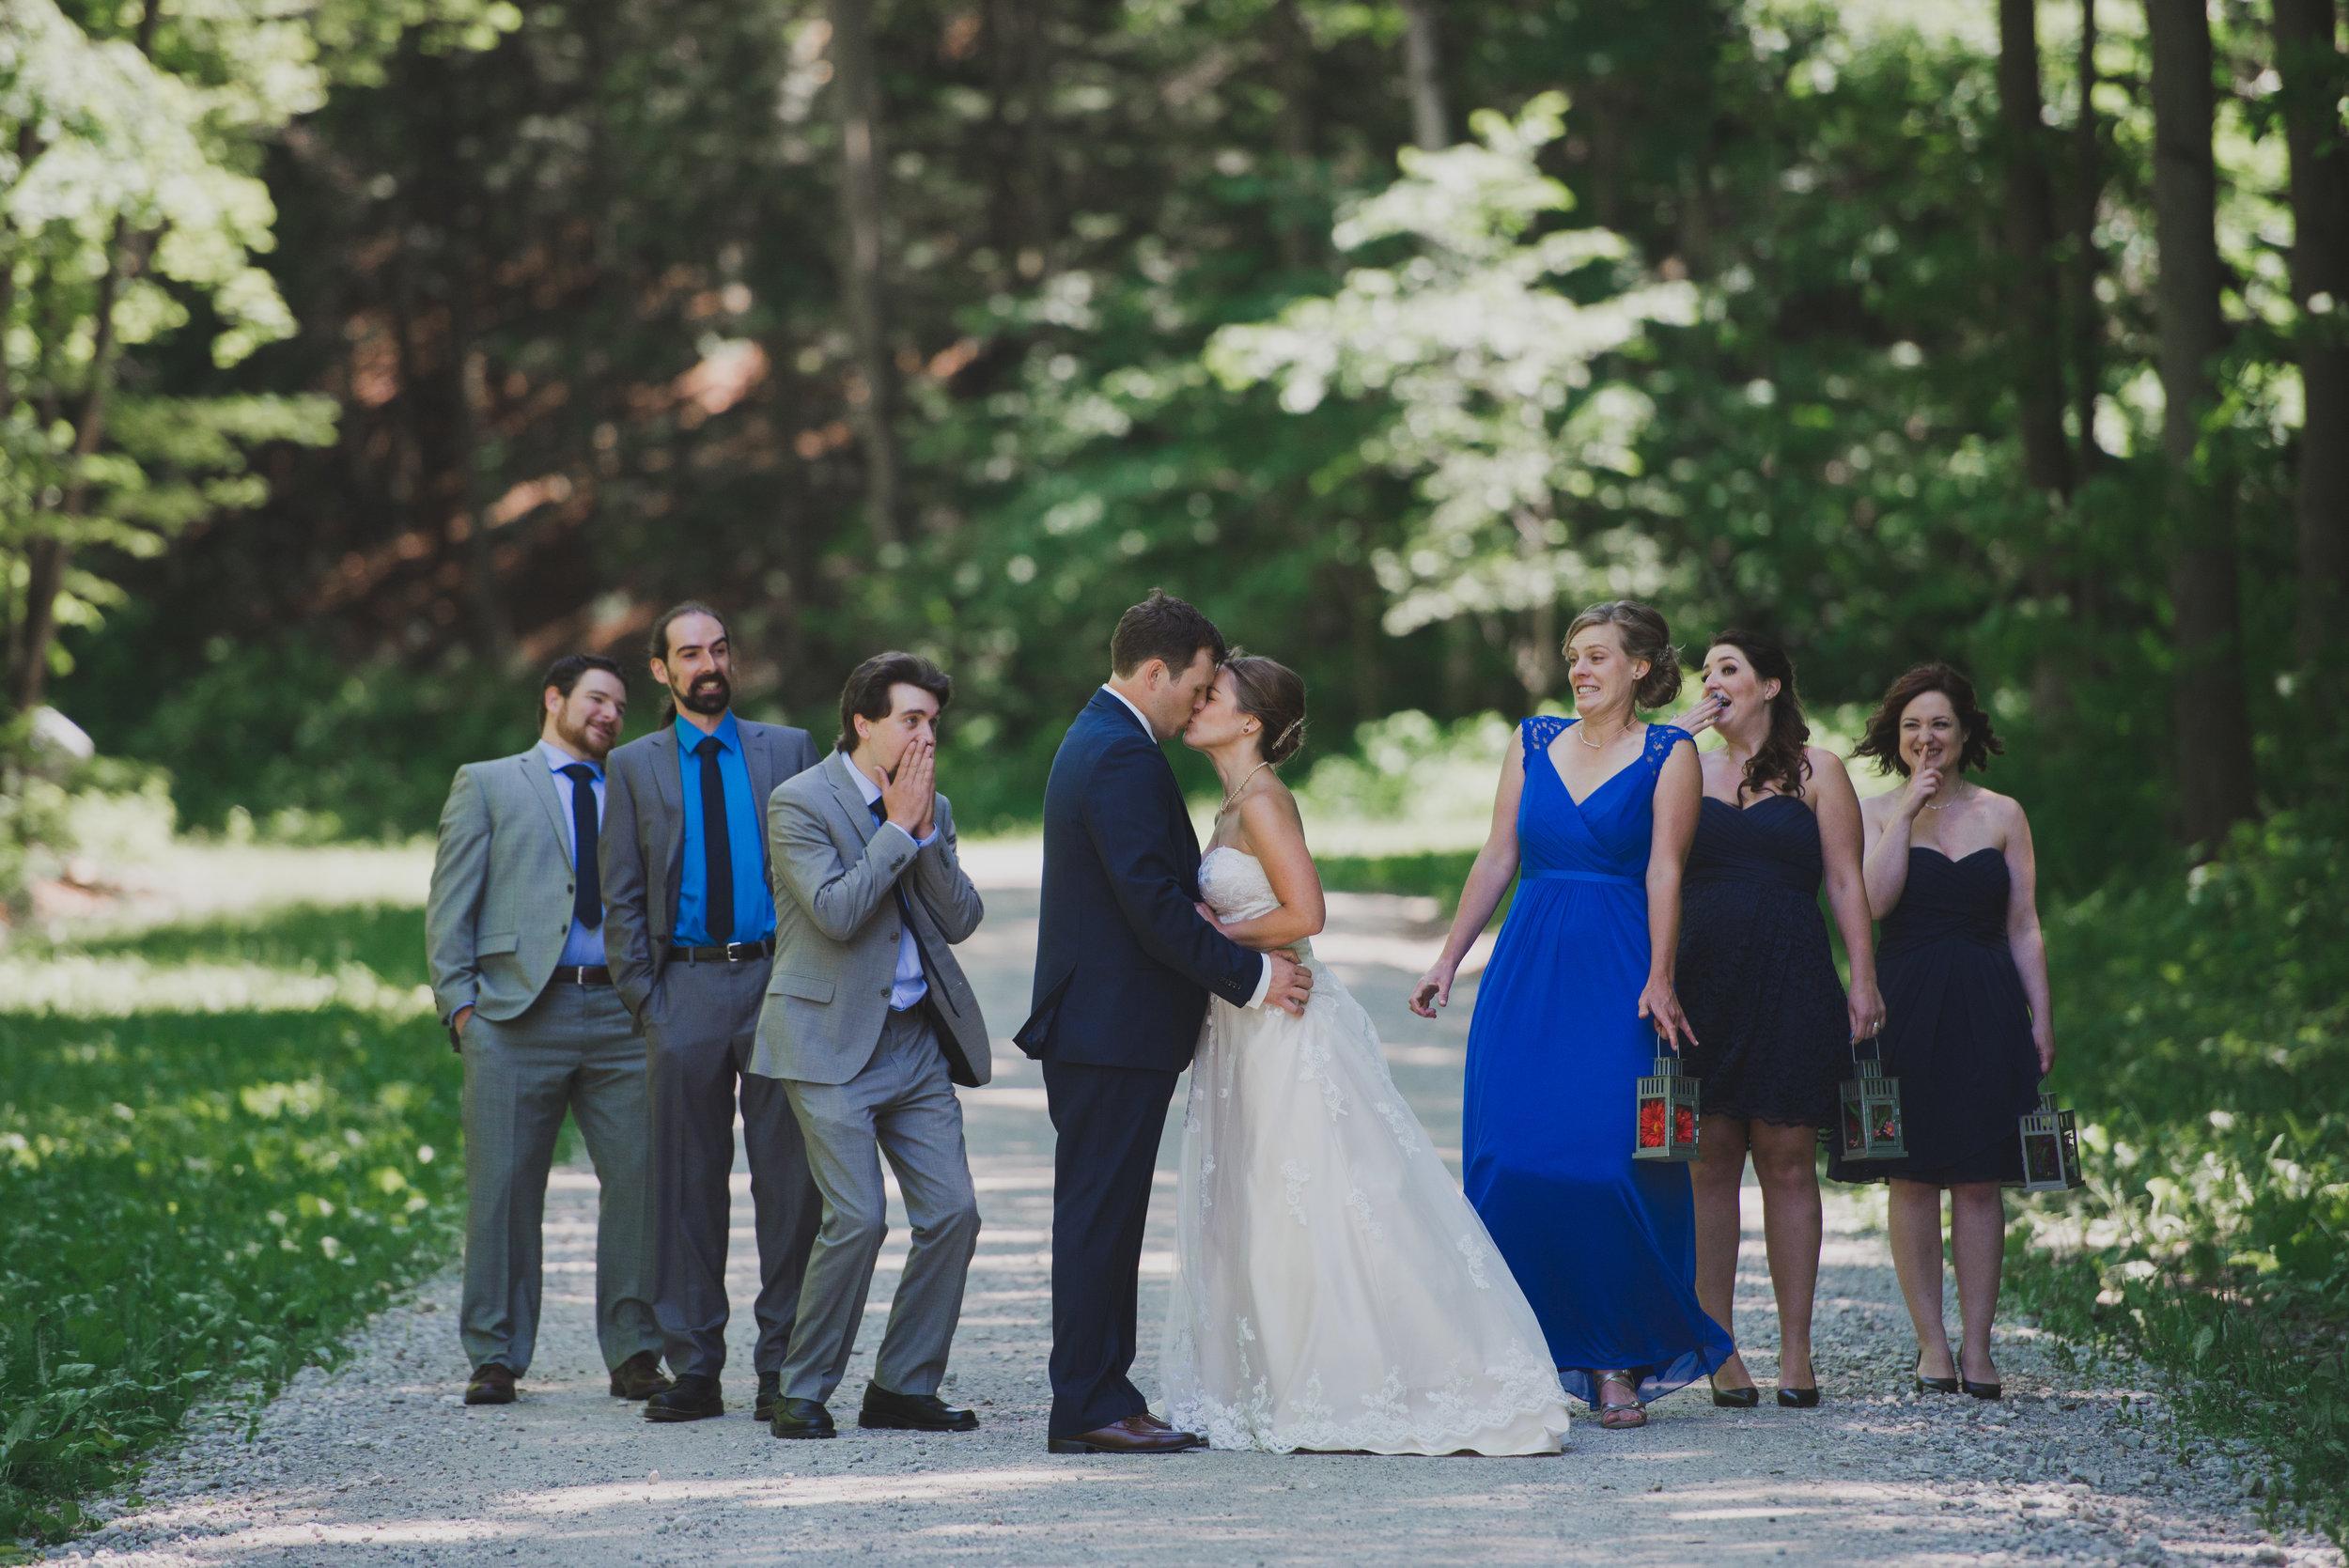 SheriCorey-Wedding-June242017-FirstLook-PortraitSession-00142.jpg